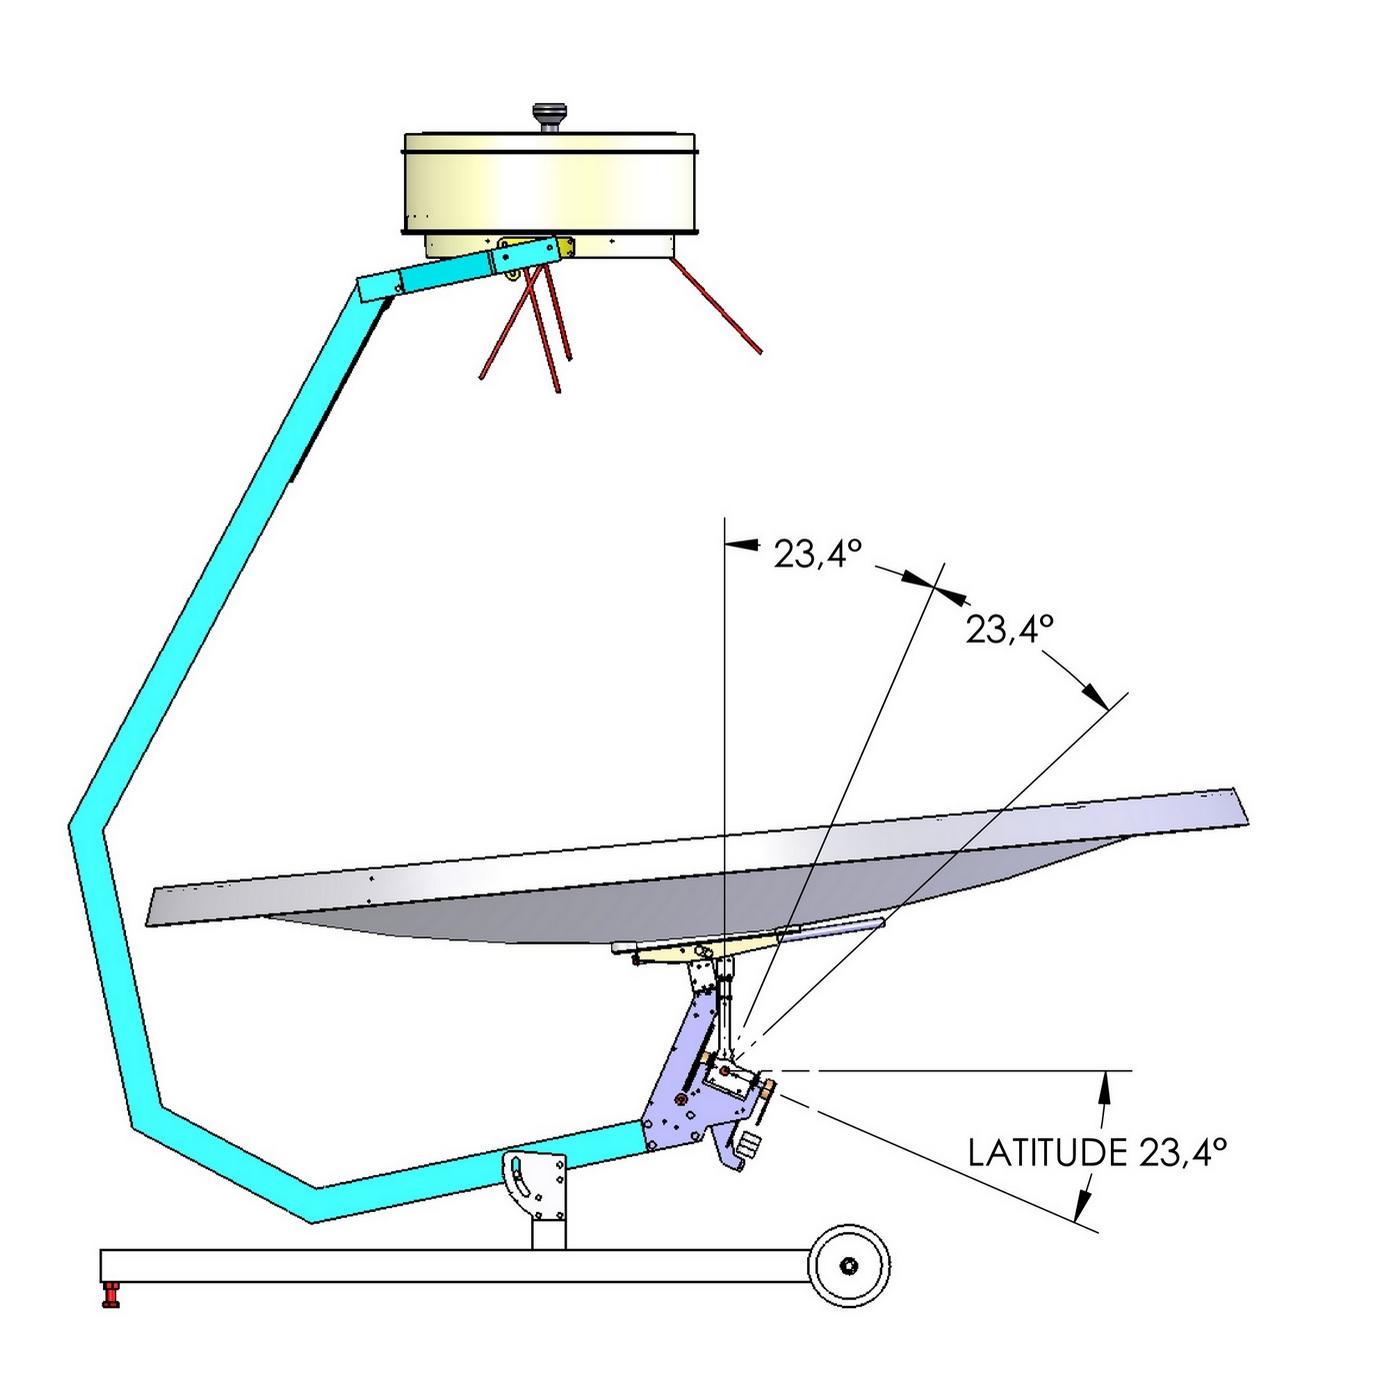 mécanisme triangle: latitude 23.44°, zénith, solstice été